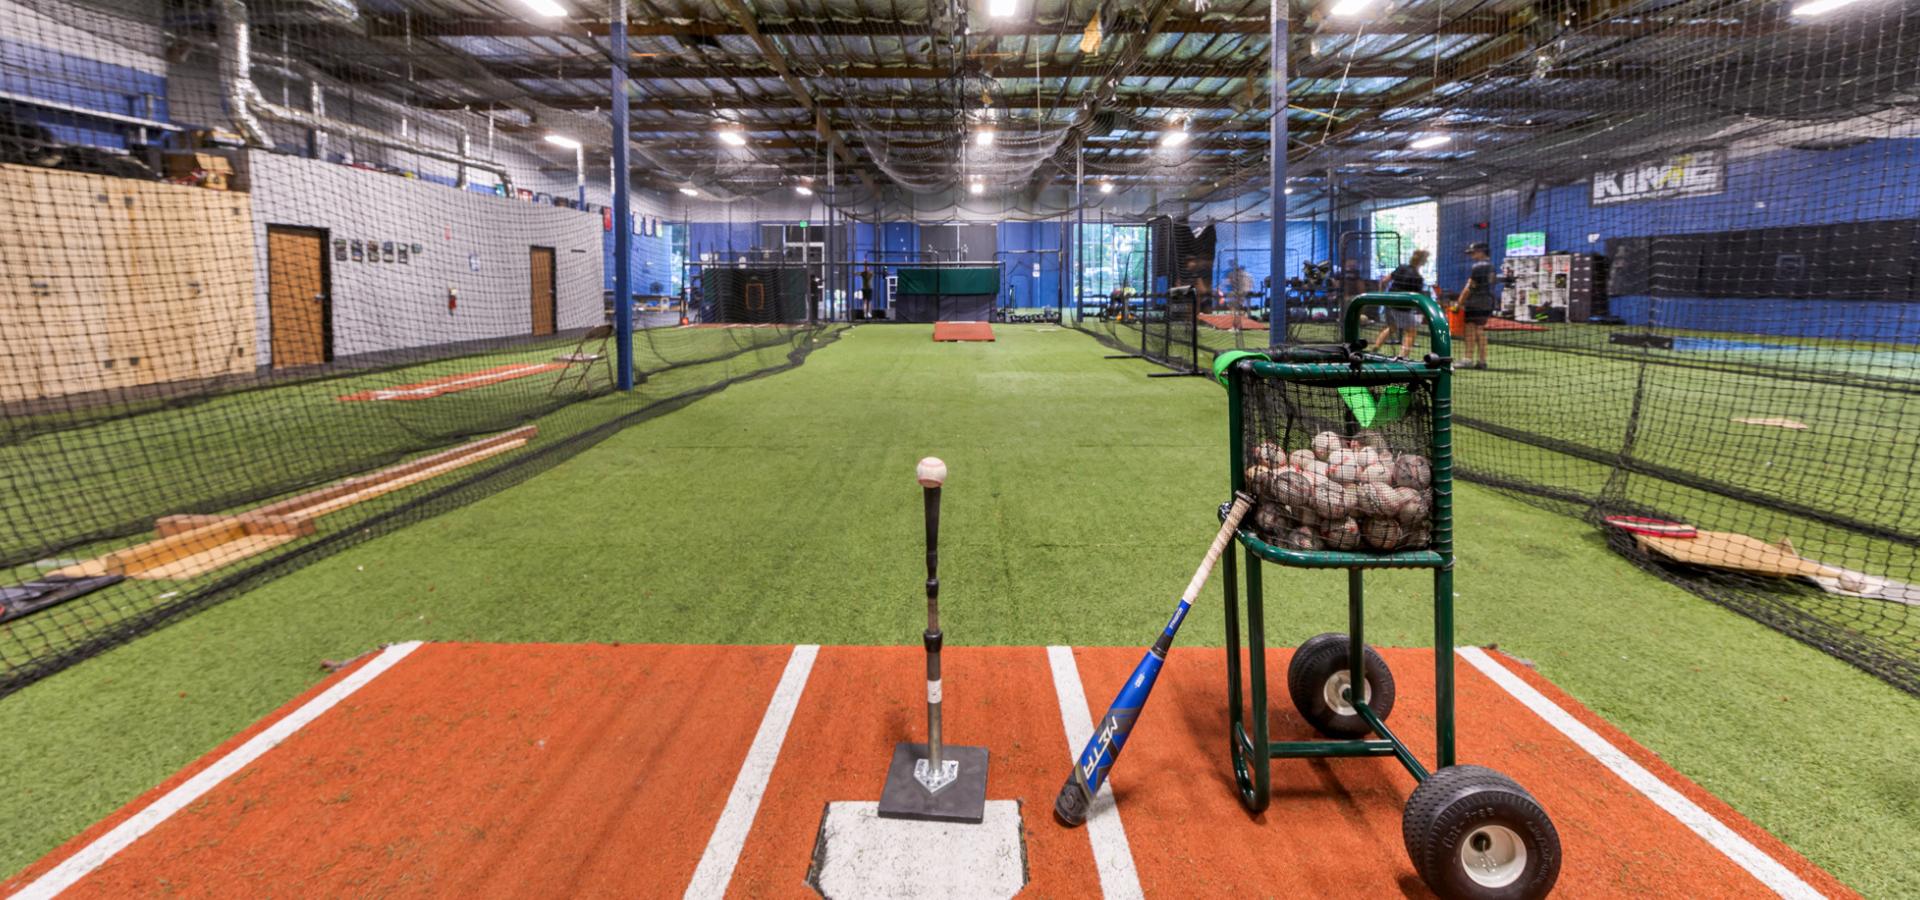 baseball training in sac